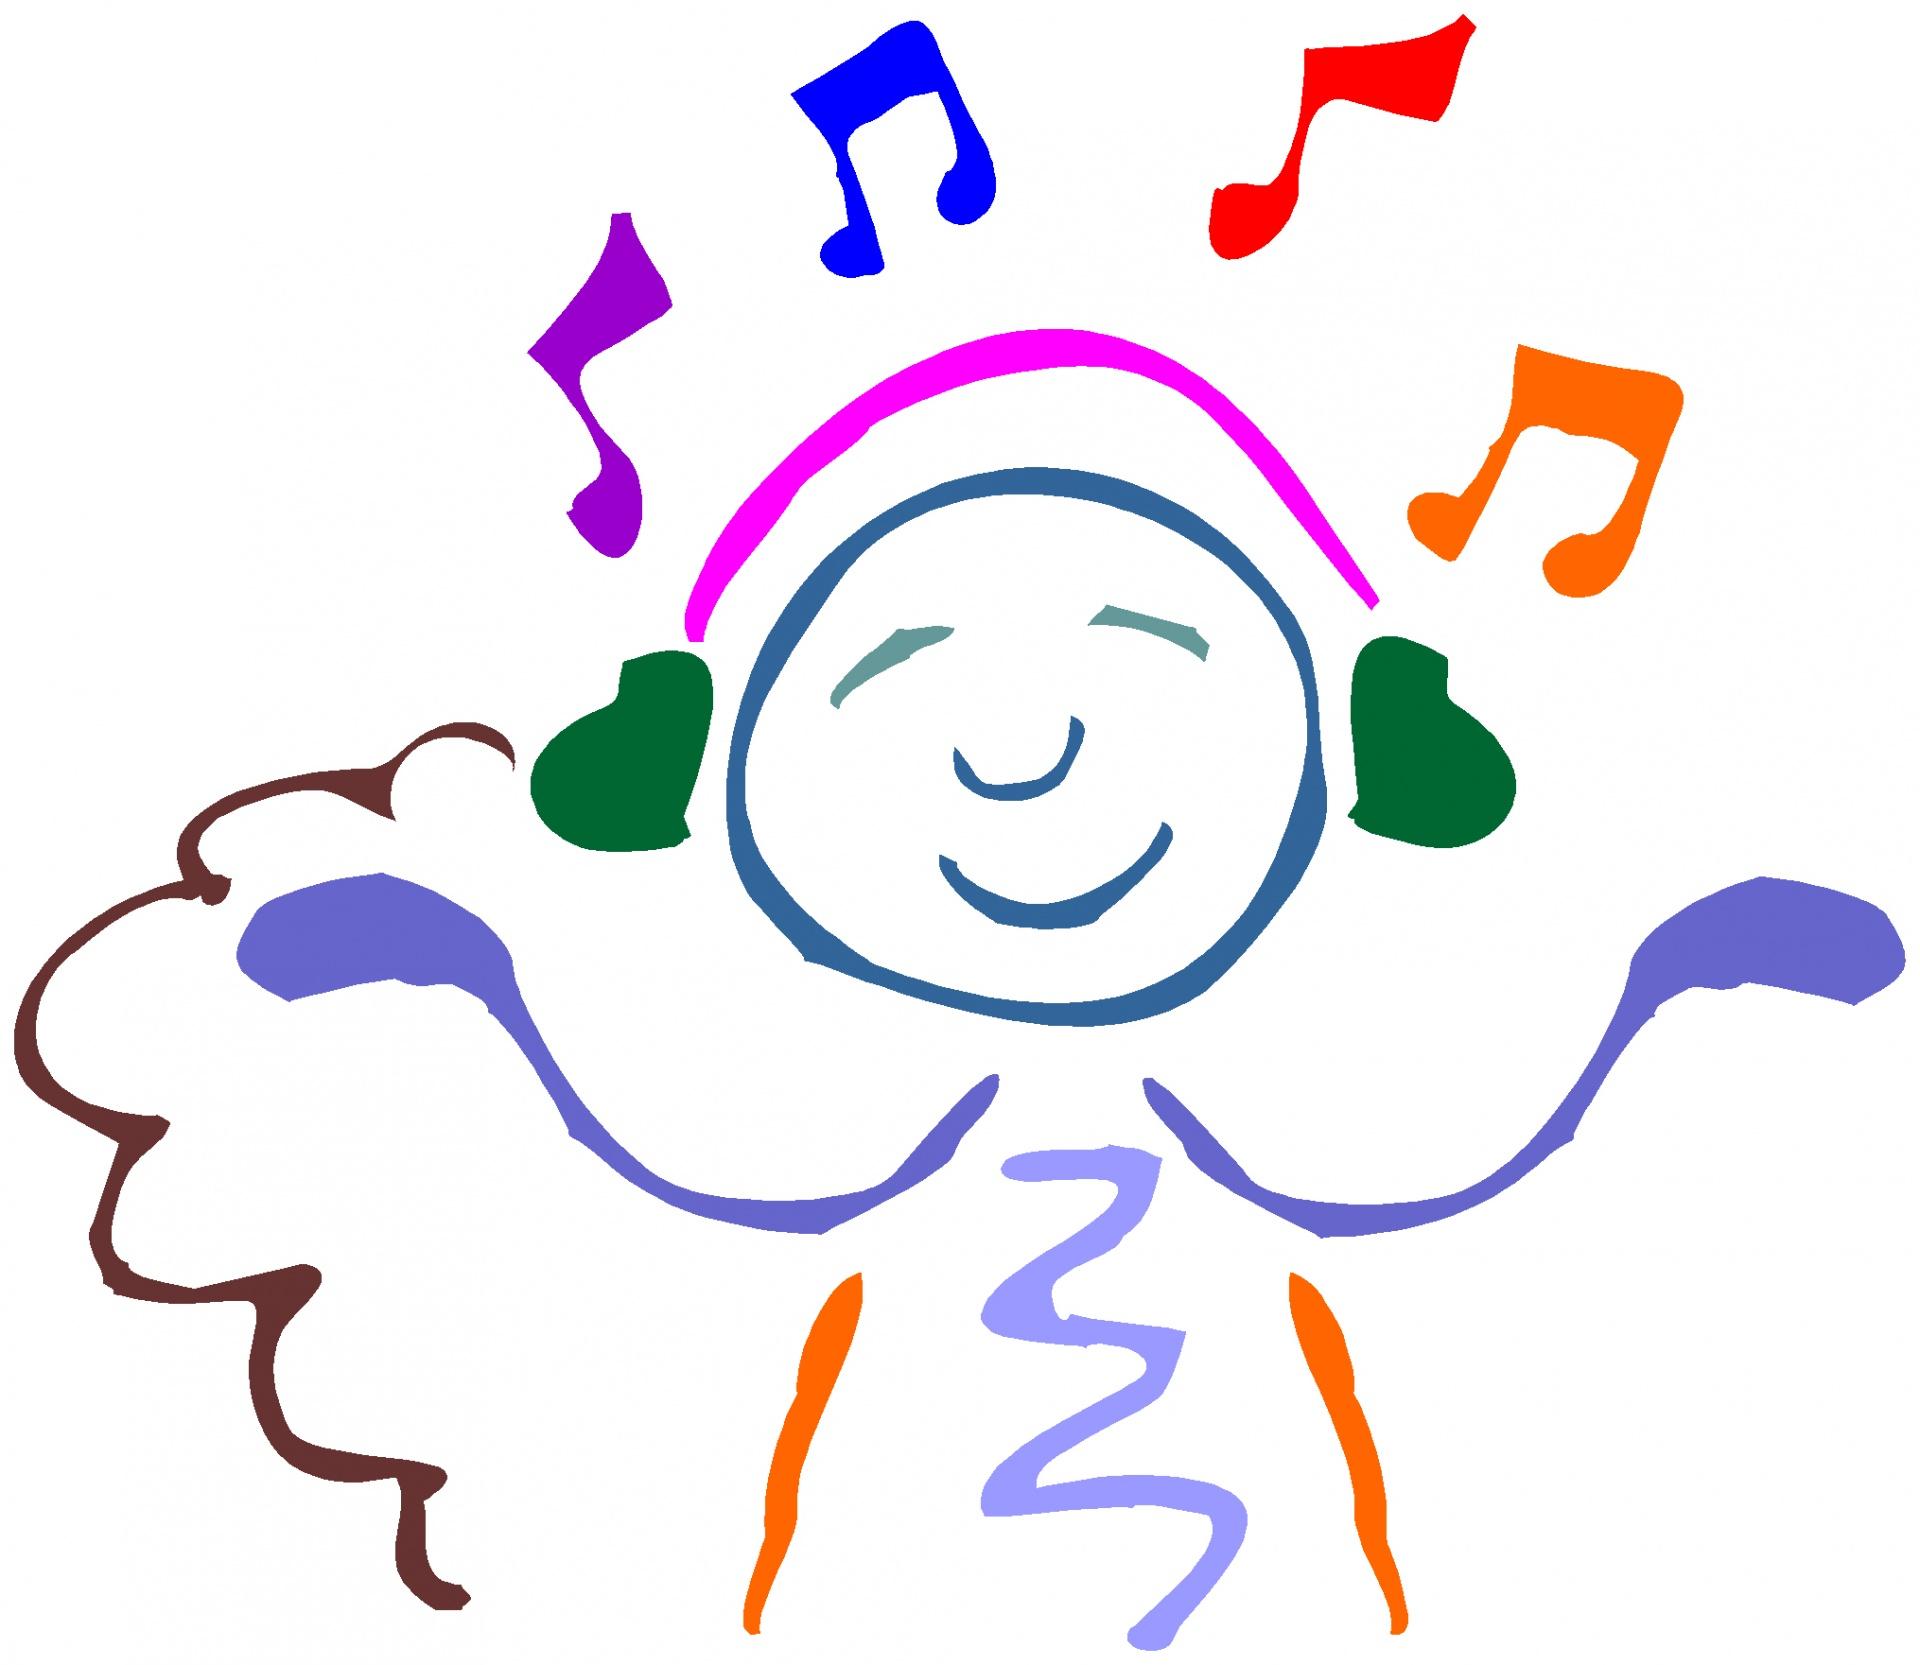 A stick figure listening to music